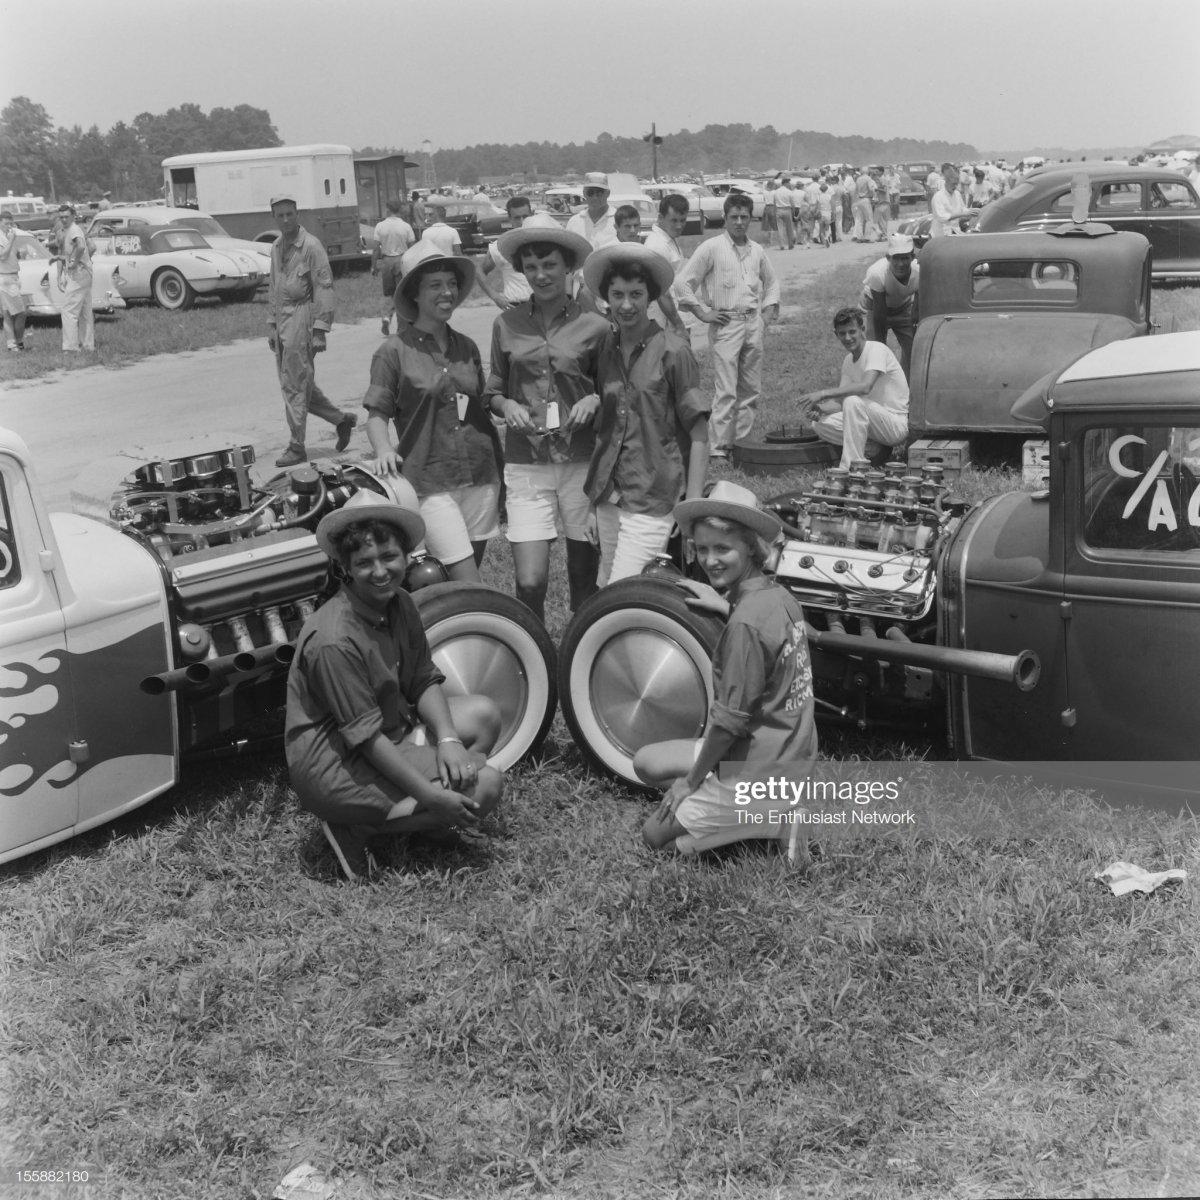 49 1958 Virginia Drags. The.jpg